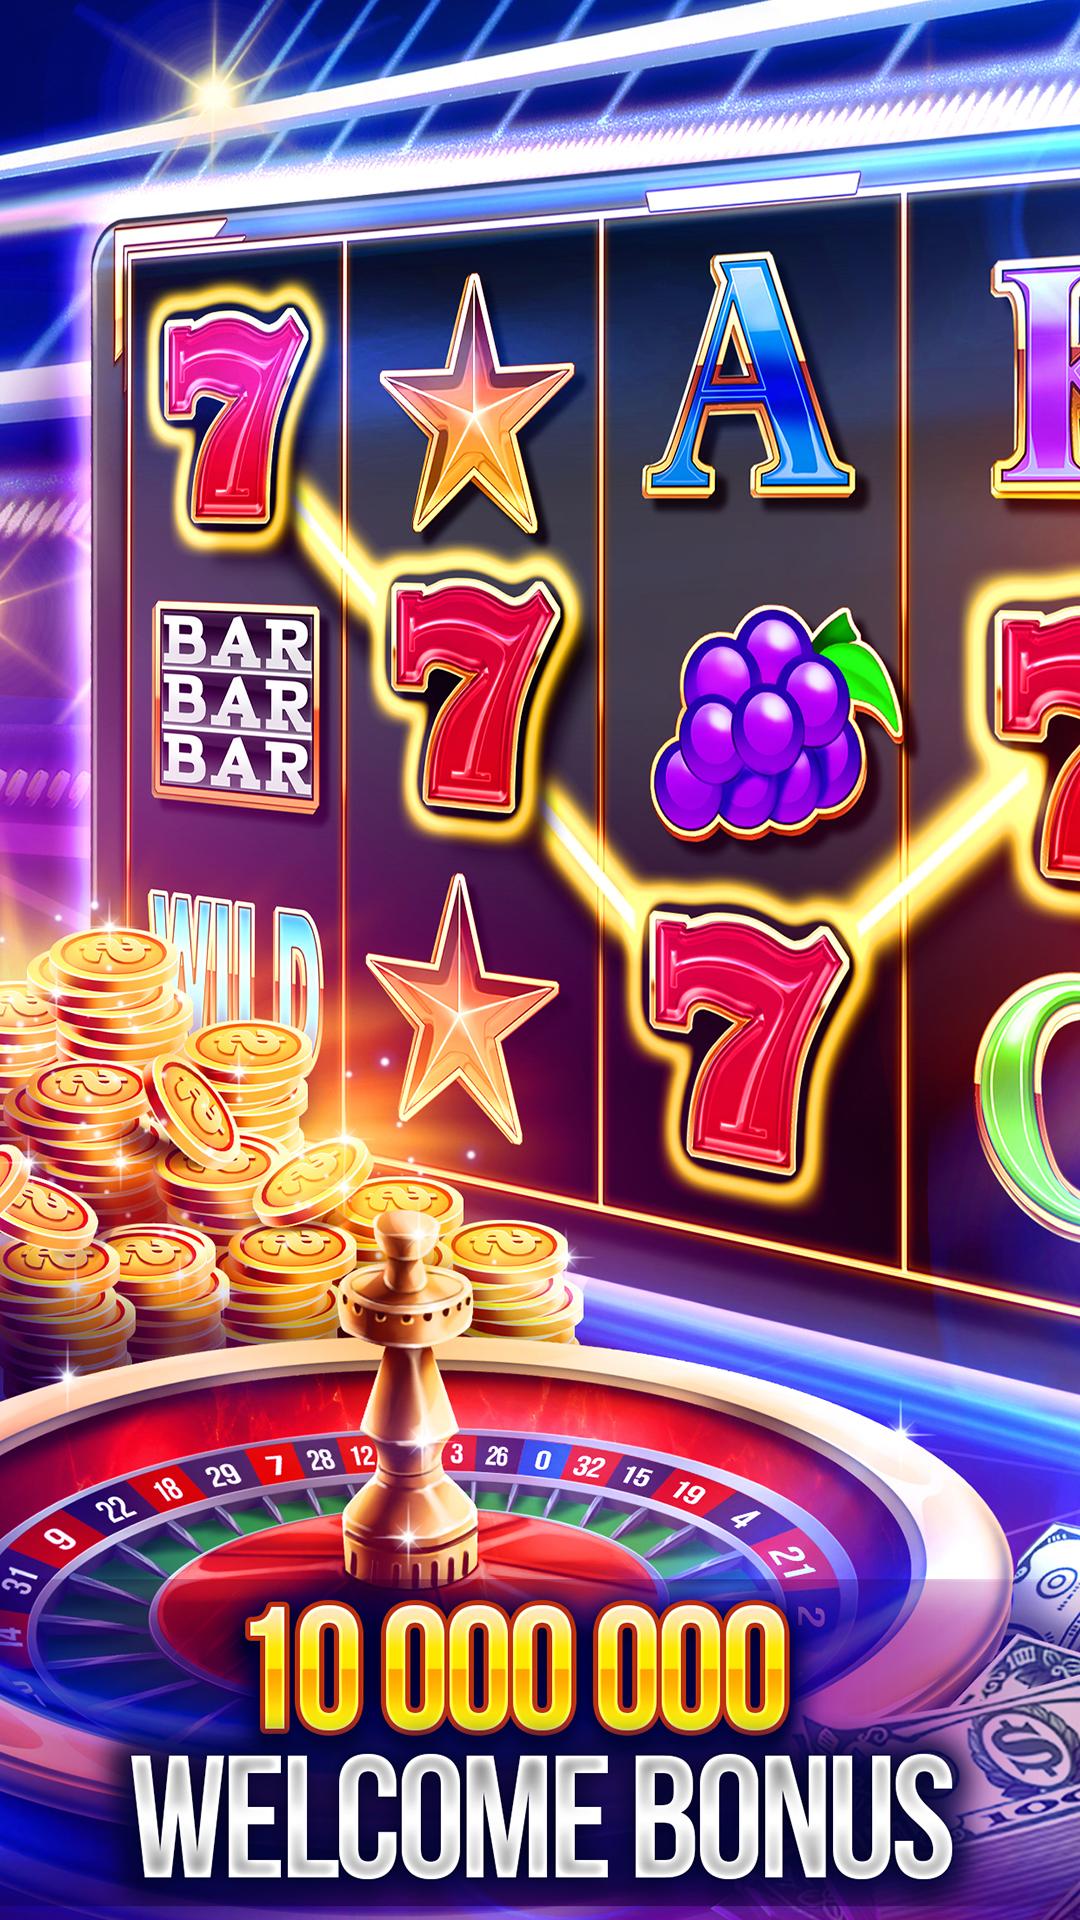 All Slots casino titanpoker com gratis - 49508